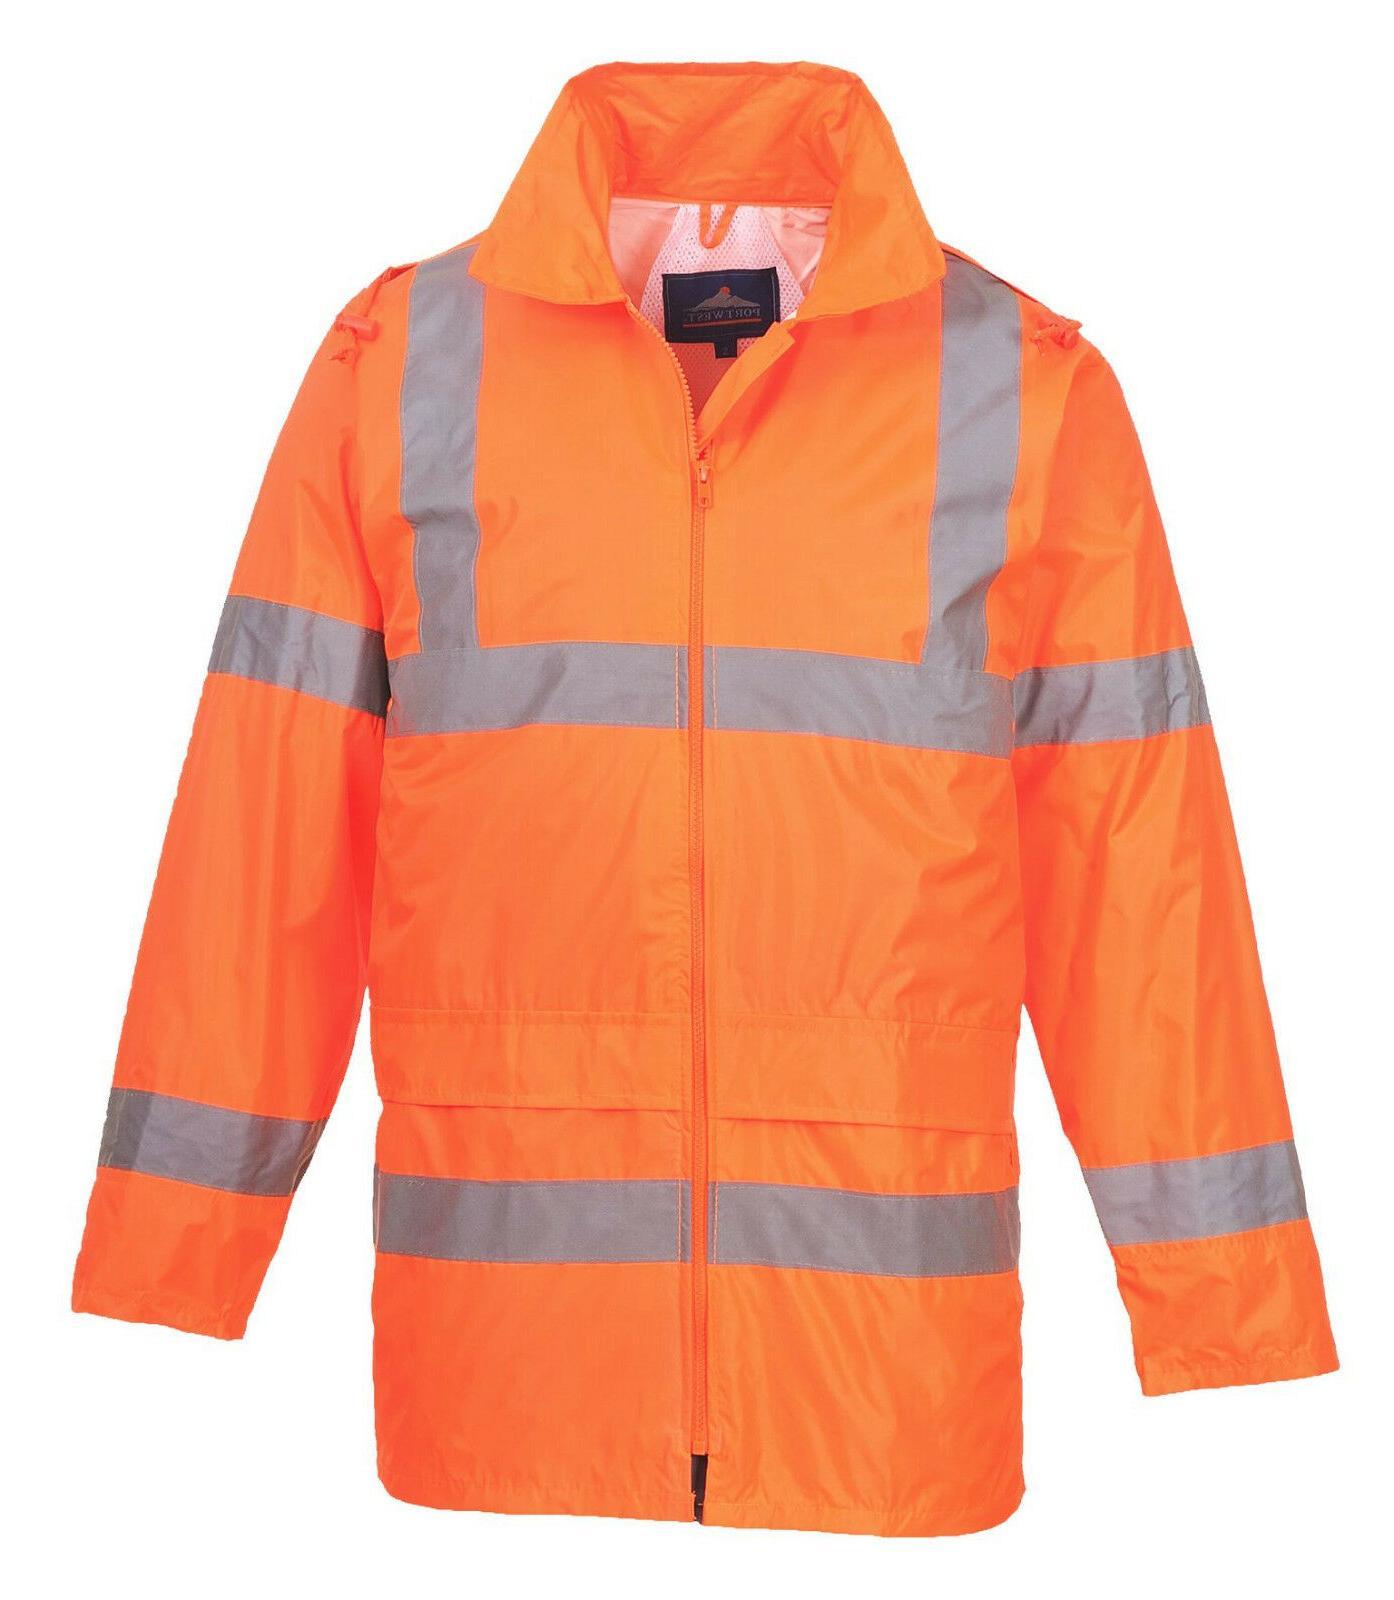 Safety Jacket w Hood S-7XL